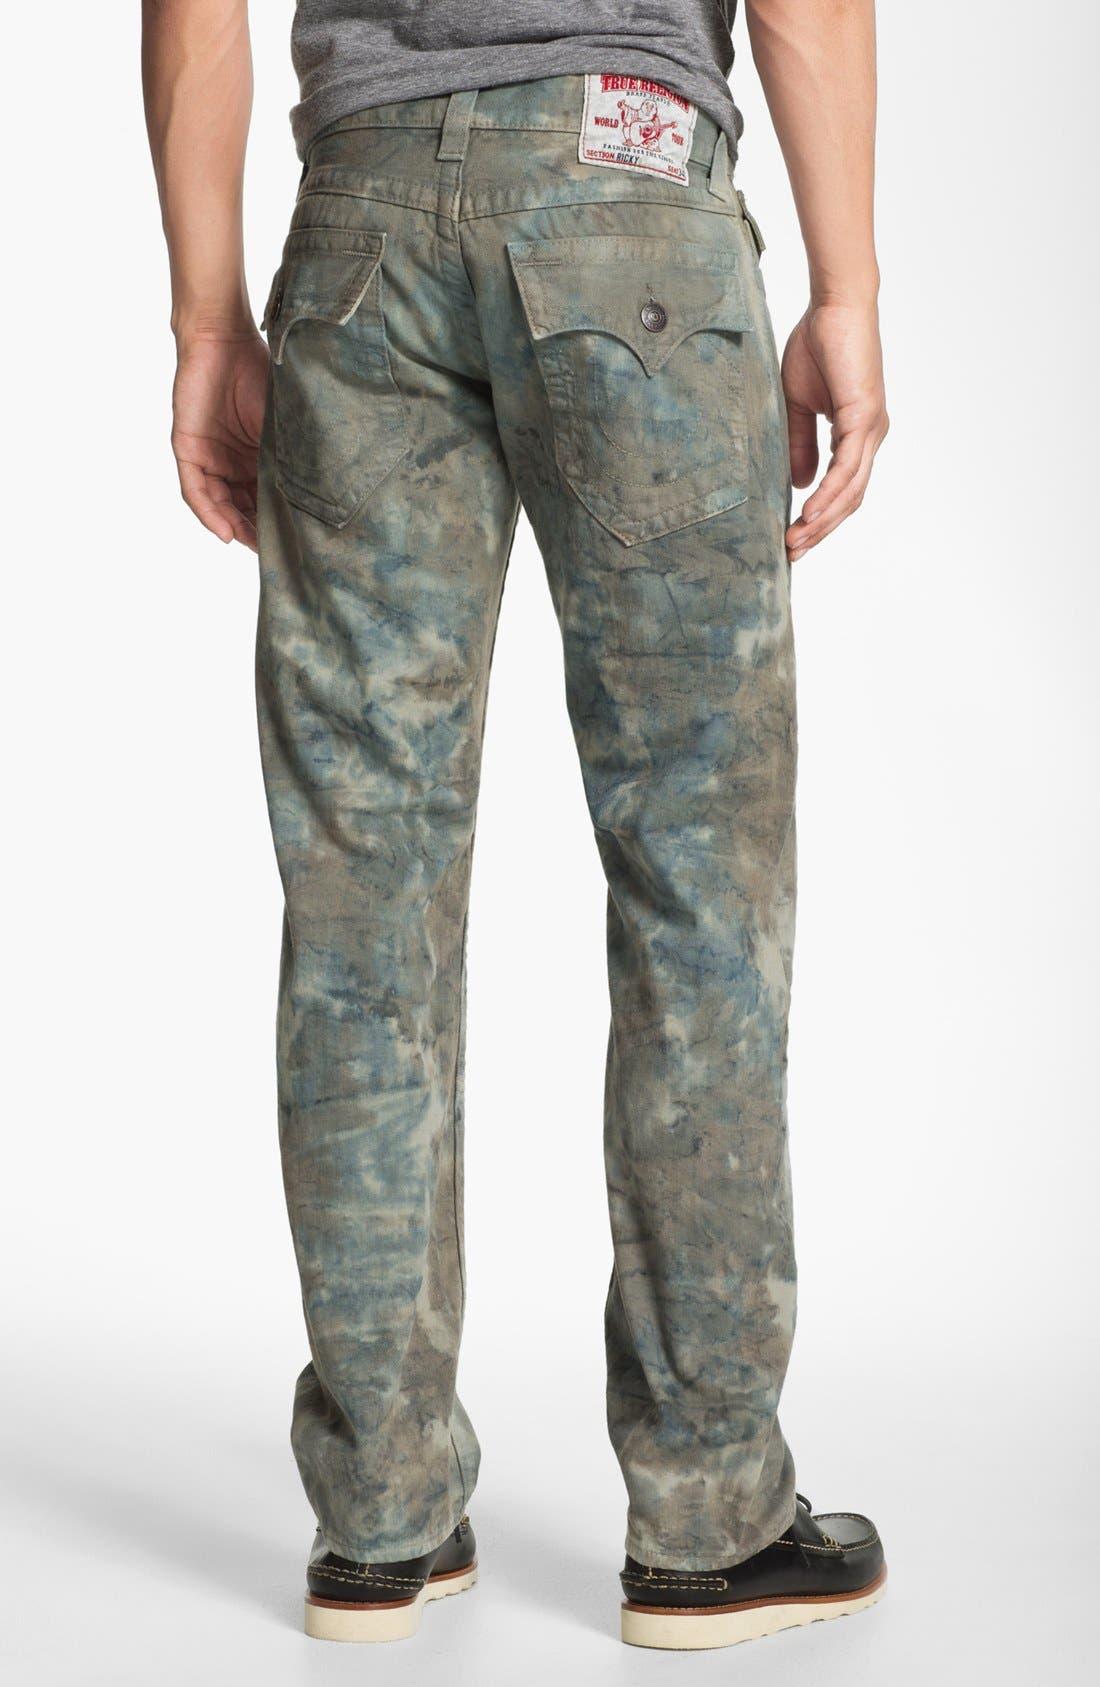 Main Image - True Religion Brand Jeans 'Ricky' Straight Leg Jeans (Olive)